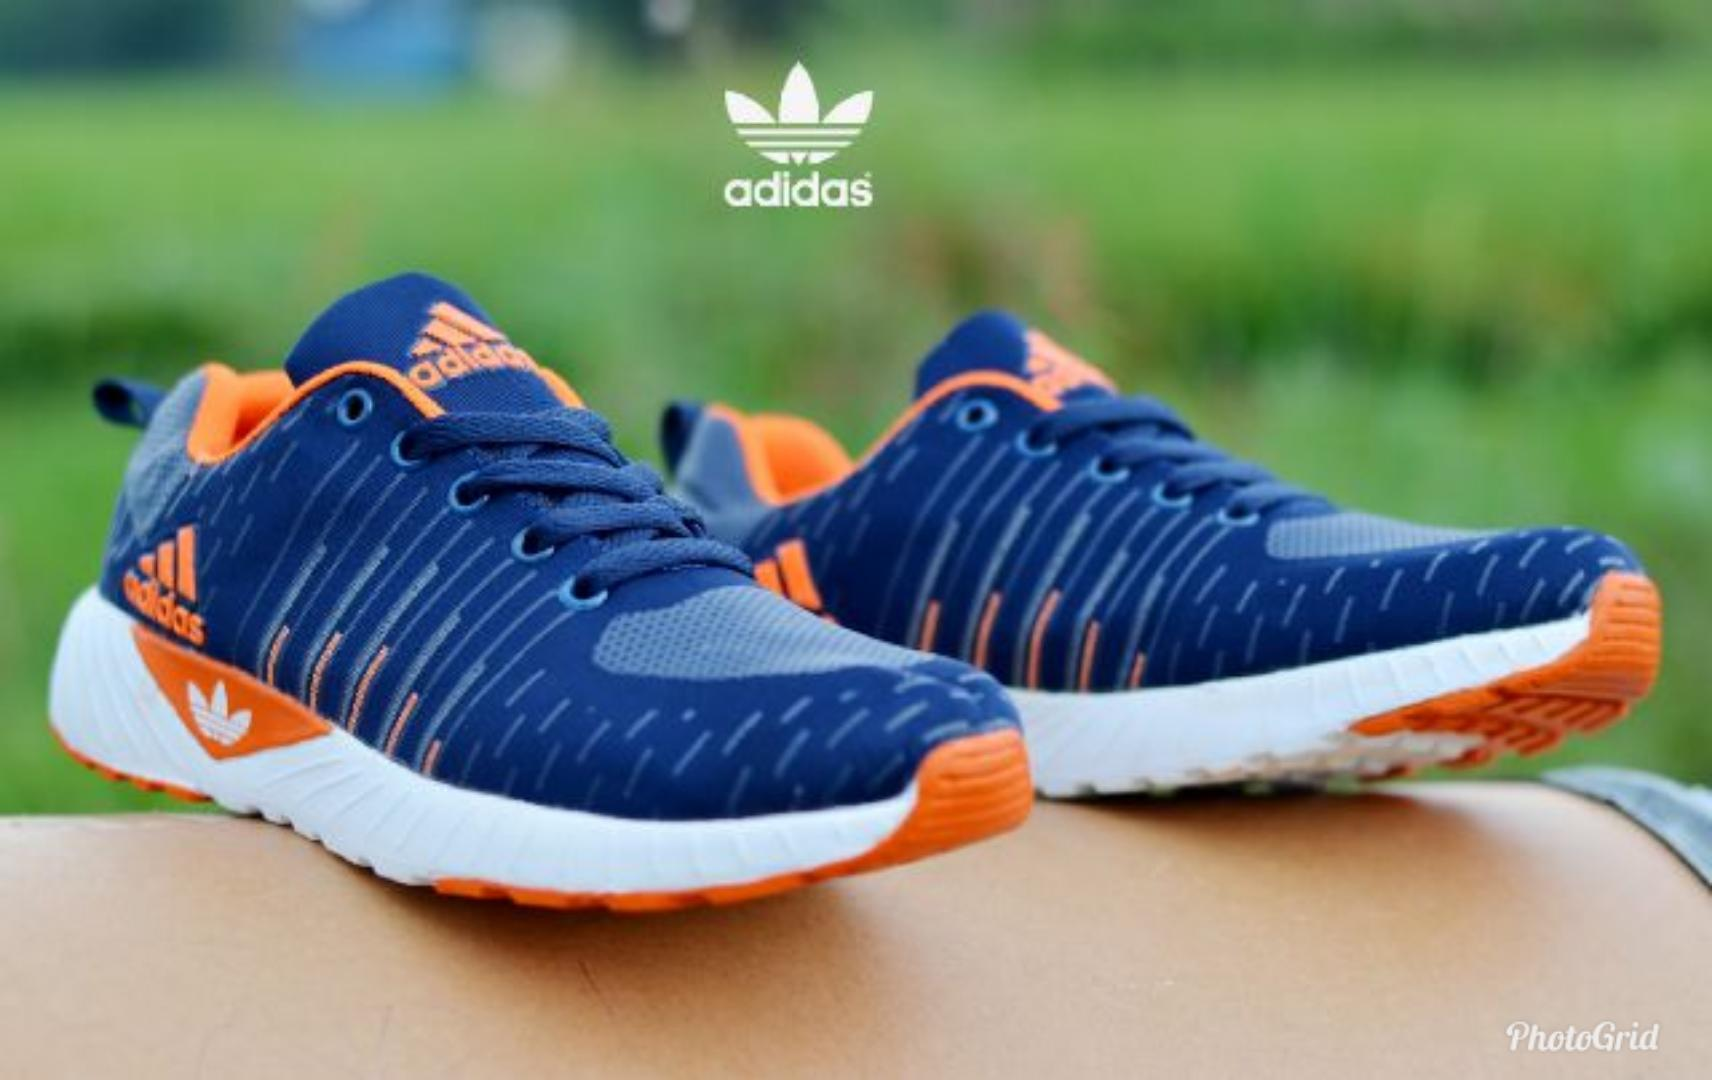 sepatu olahraga sport adidas lari runing jogging ringan di pakai kuat  berkualitas murah 397fc617e5